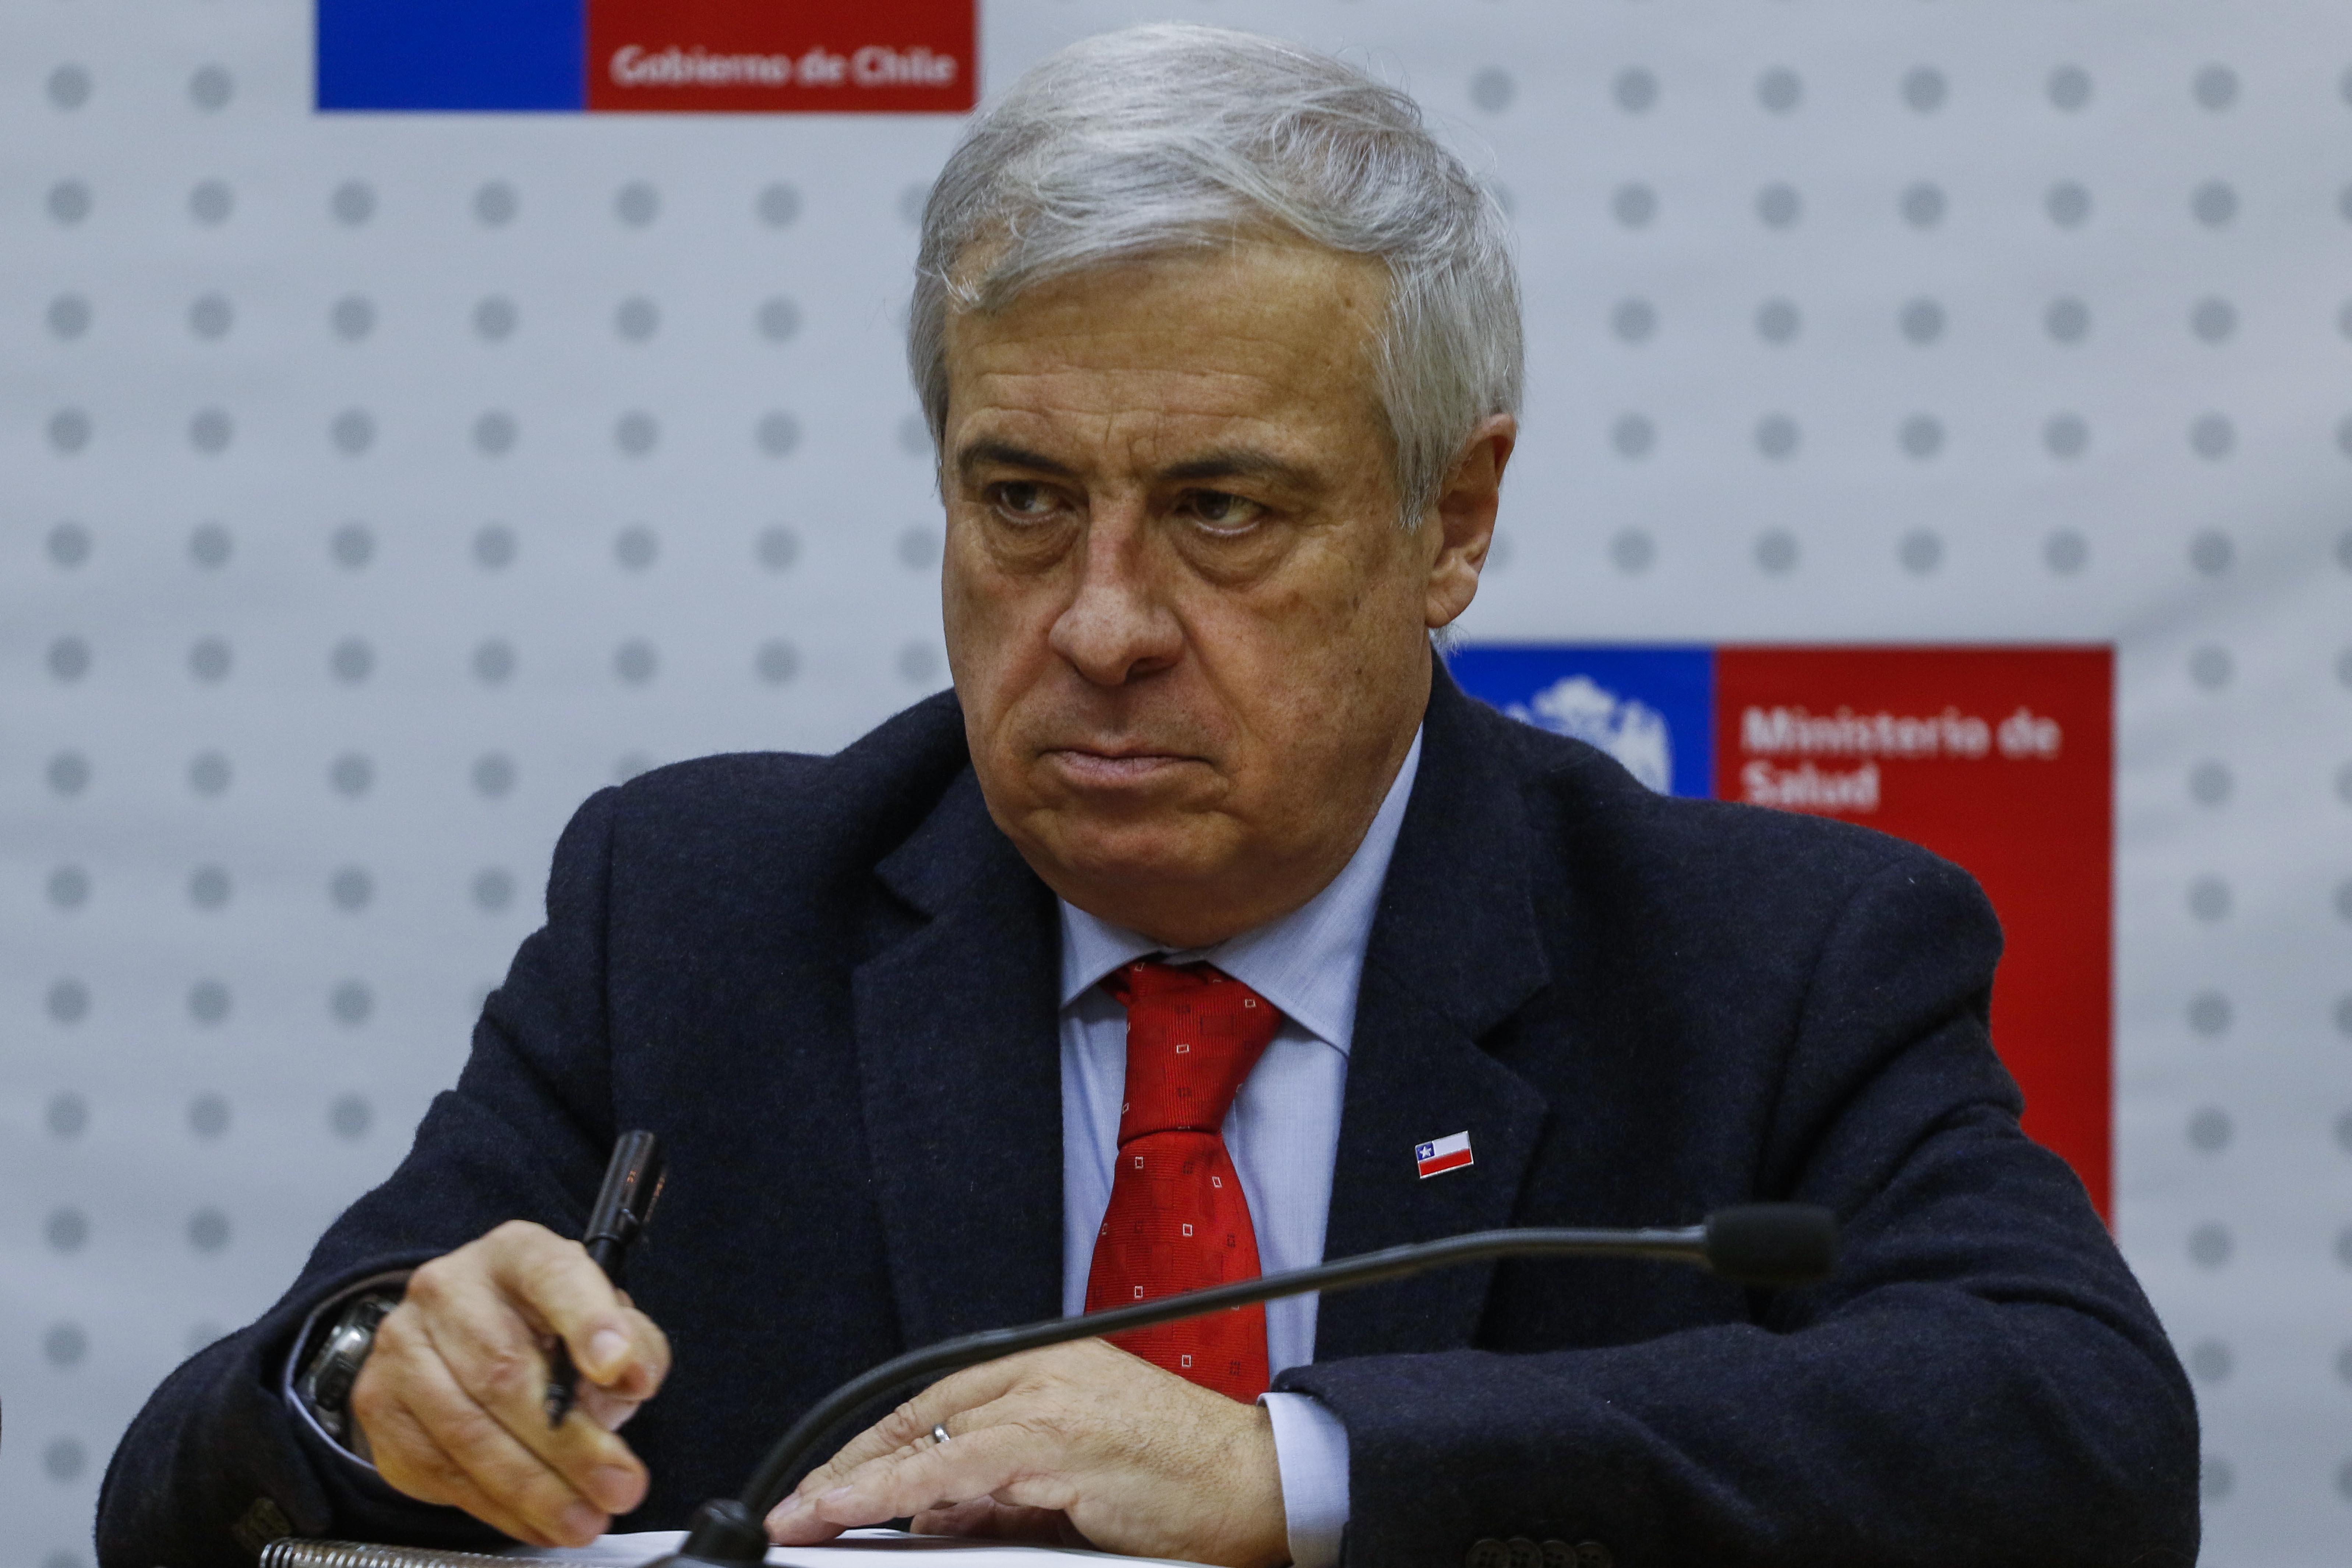 Jaime Mañalich